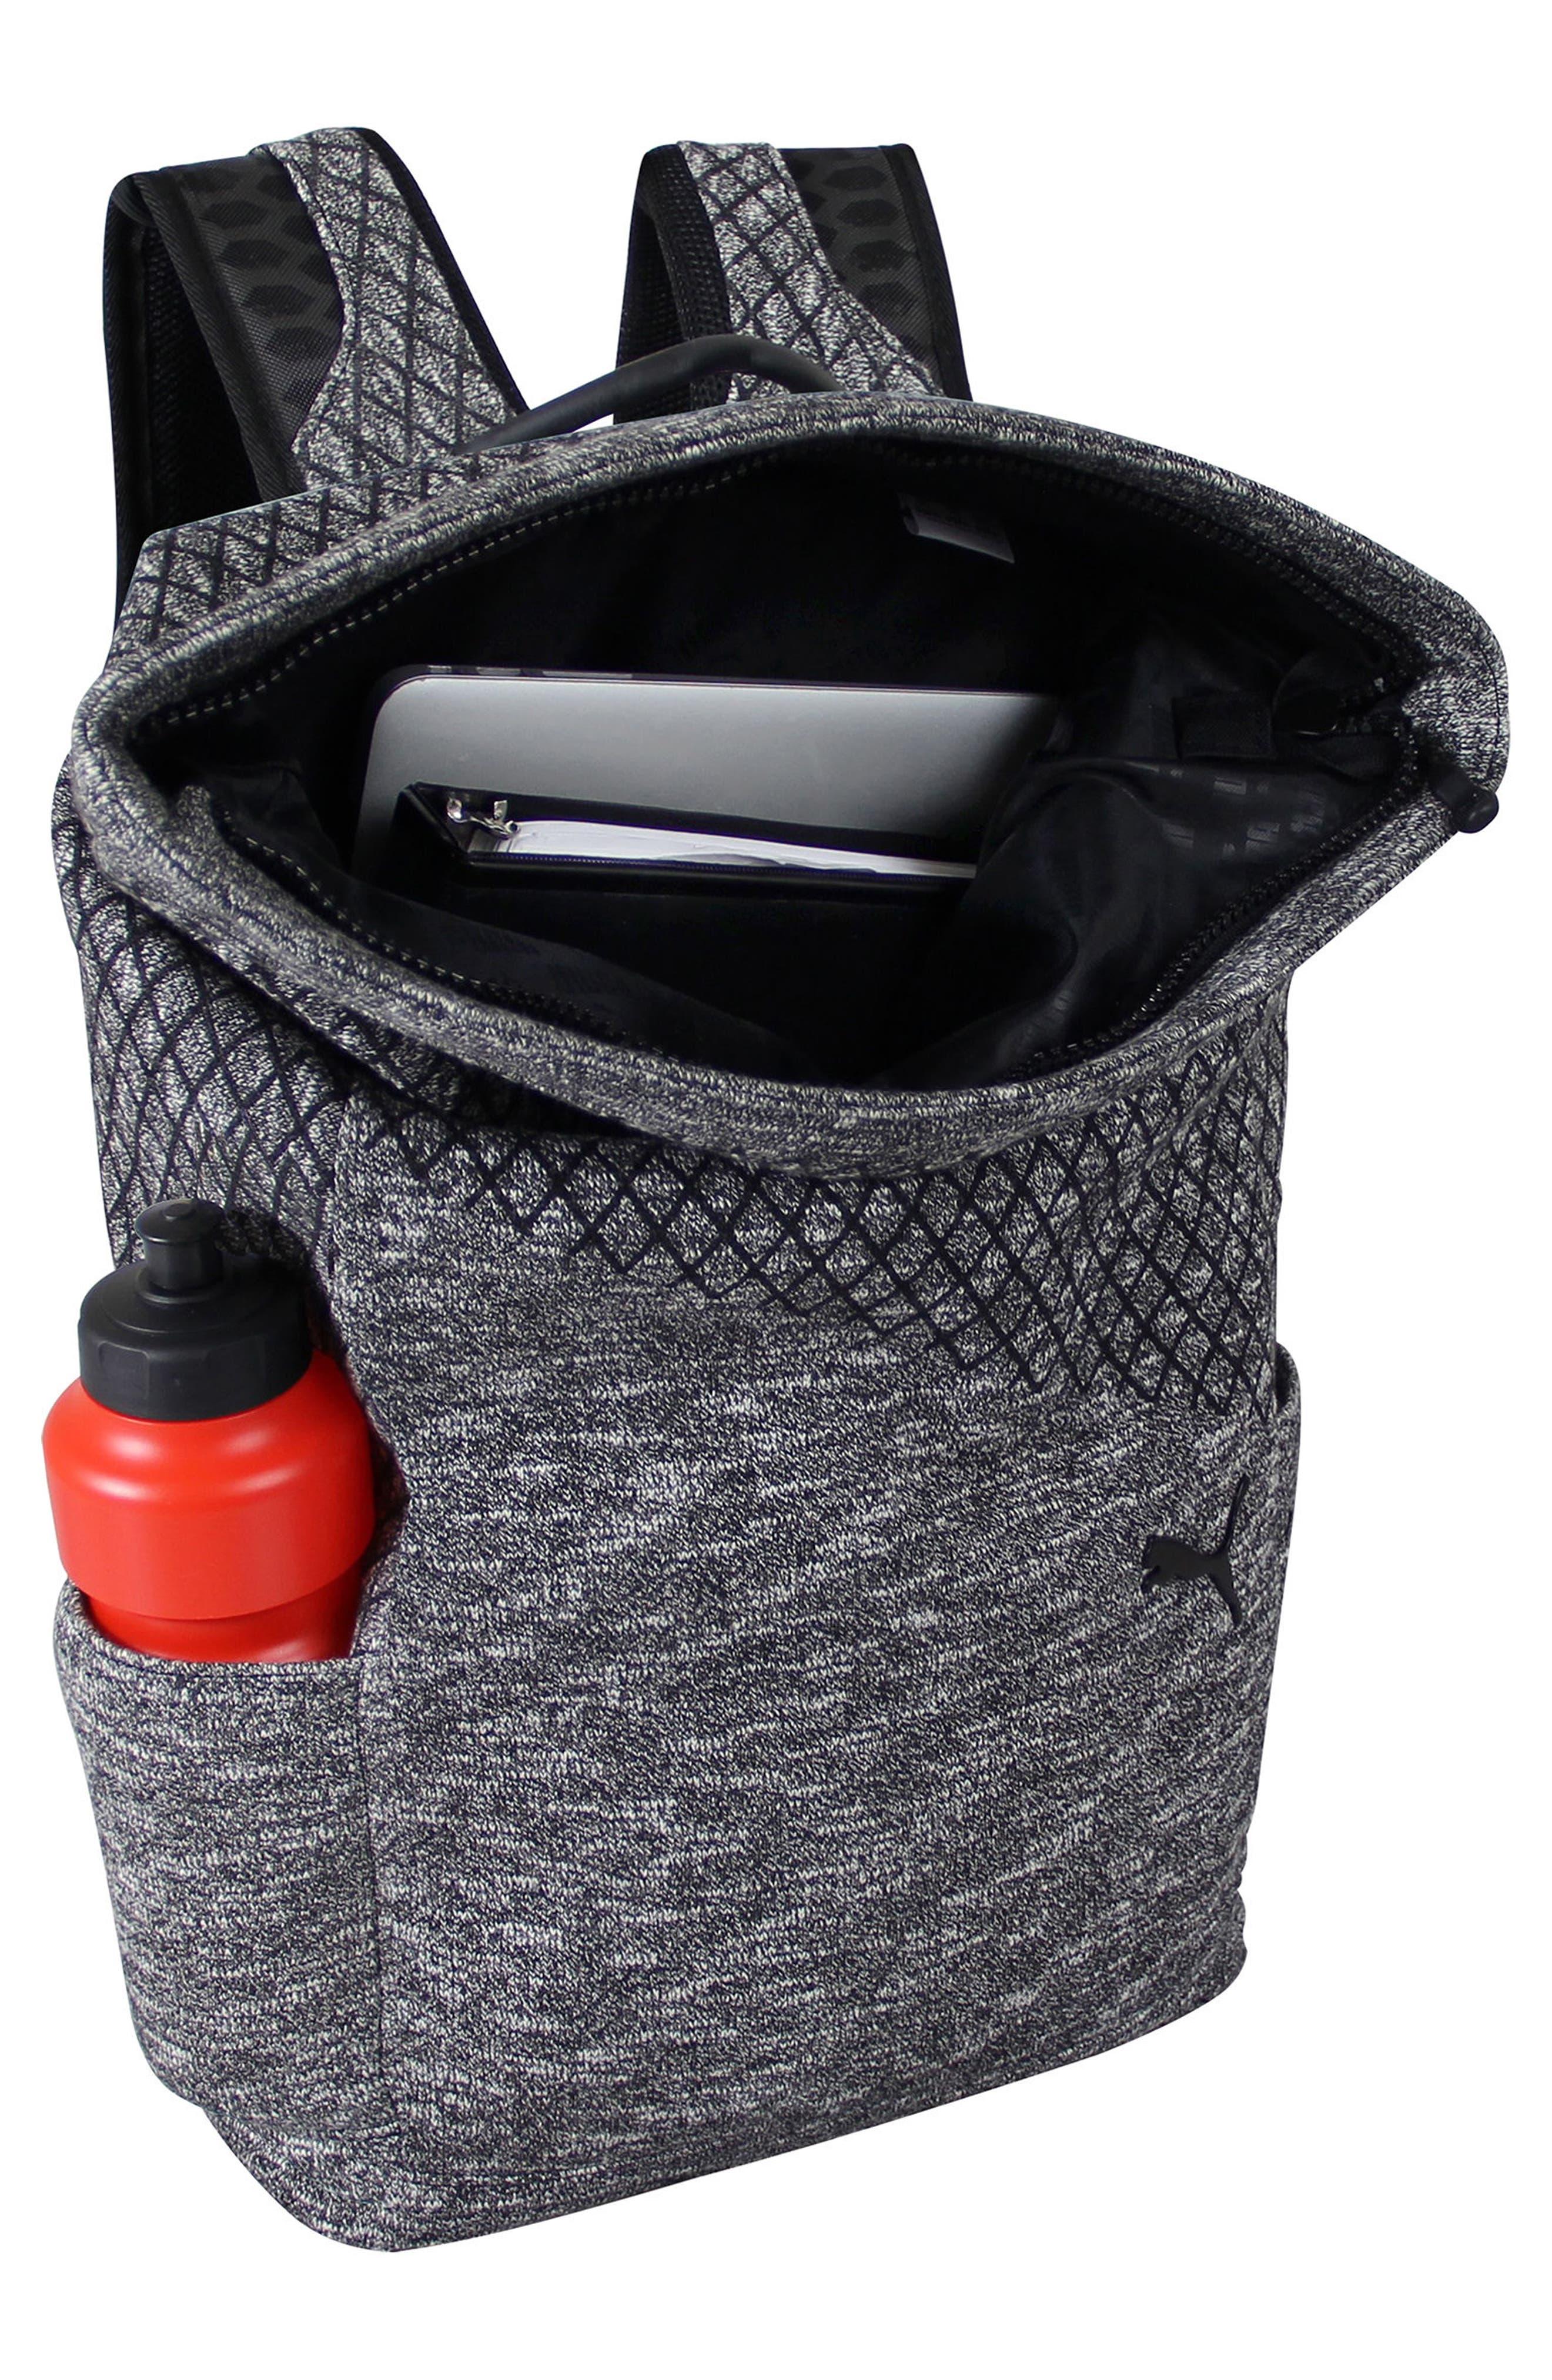 Evo 2.0 Foldover Top Knit Backpack,                             Alternate thumbnail 2, color,                             BLACK/ GREY